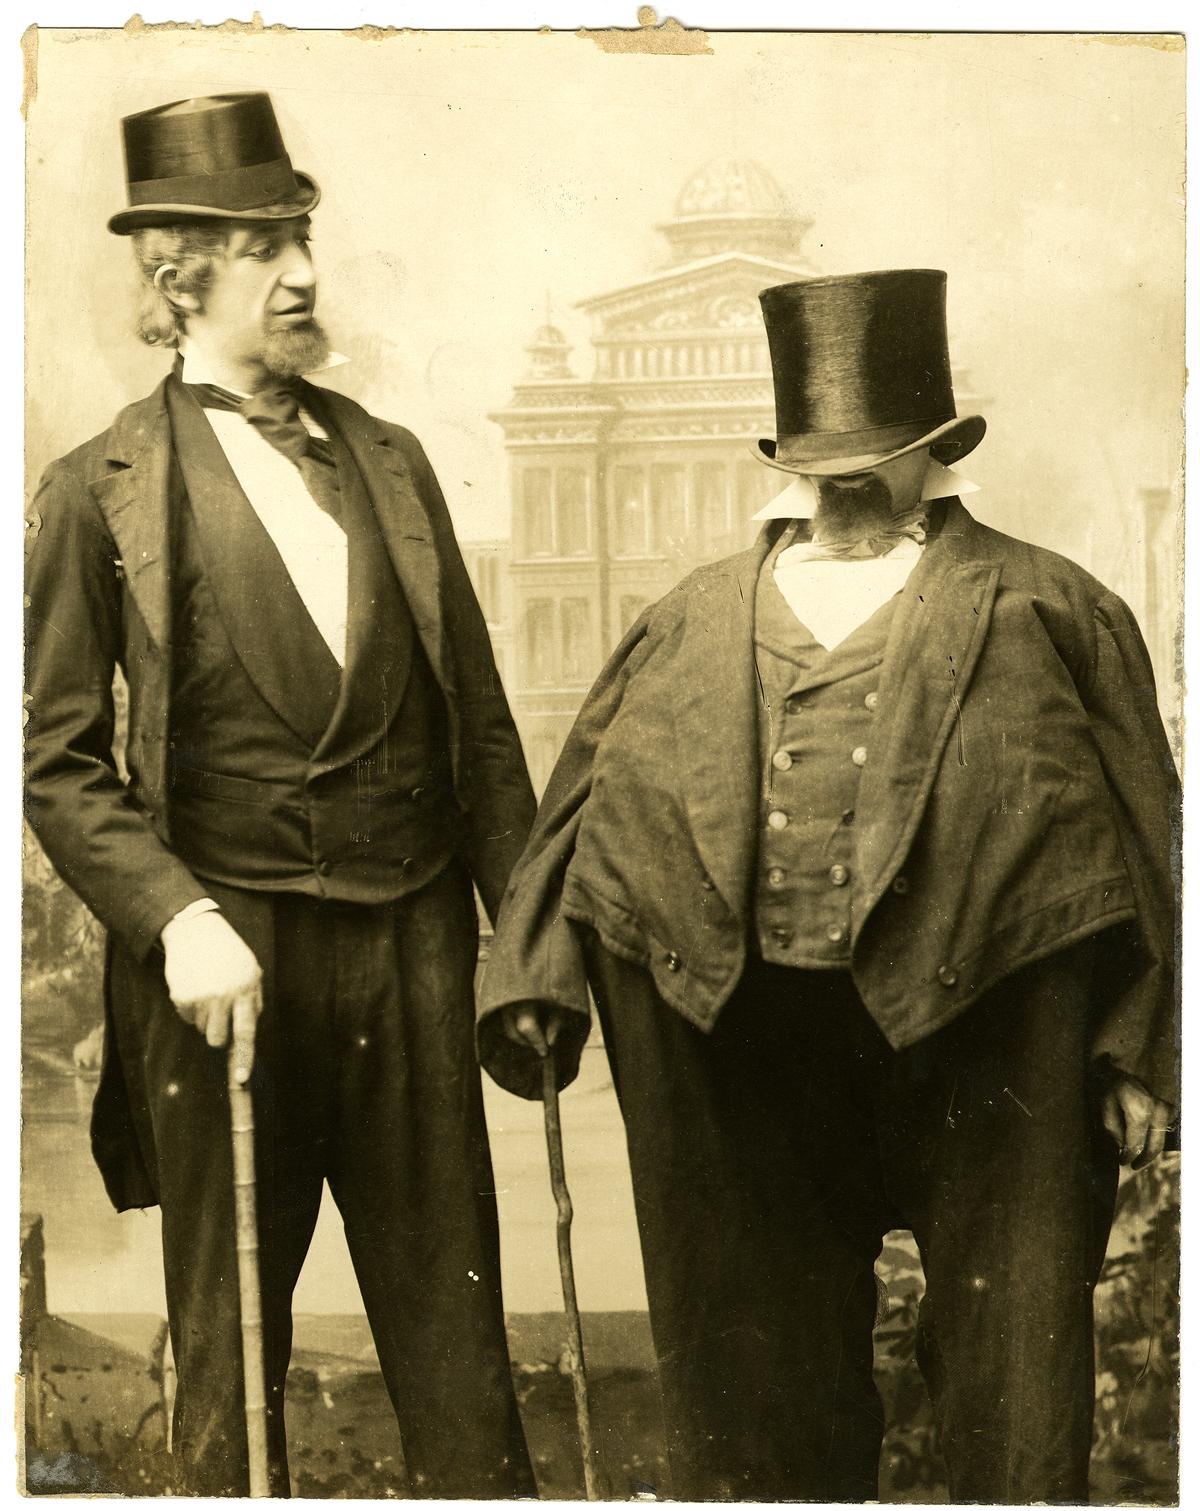 Unidentified photographer, [Weber and Fields in their German Senators routine], ca. 1887. Gelatin silver print, 25.5 x 20.3 c